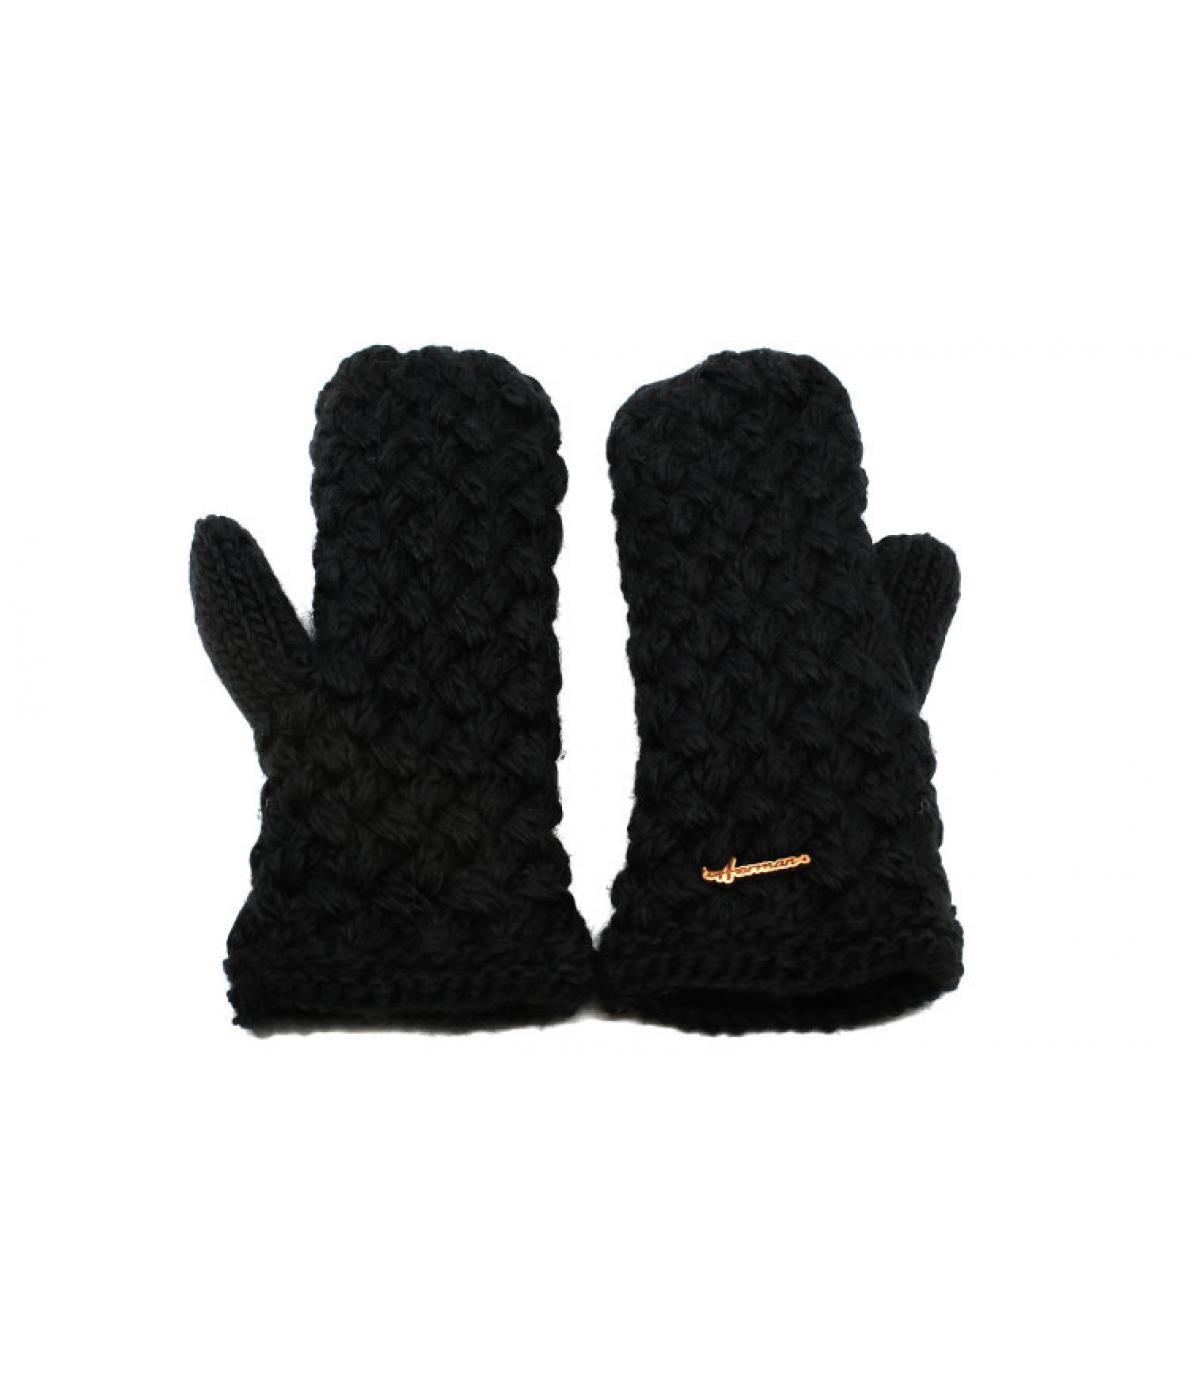 black wool mittens